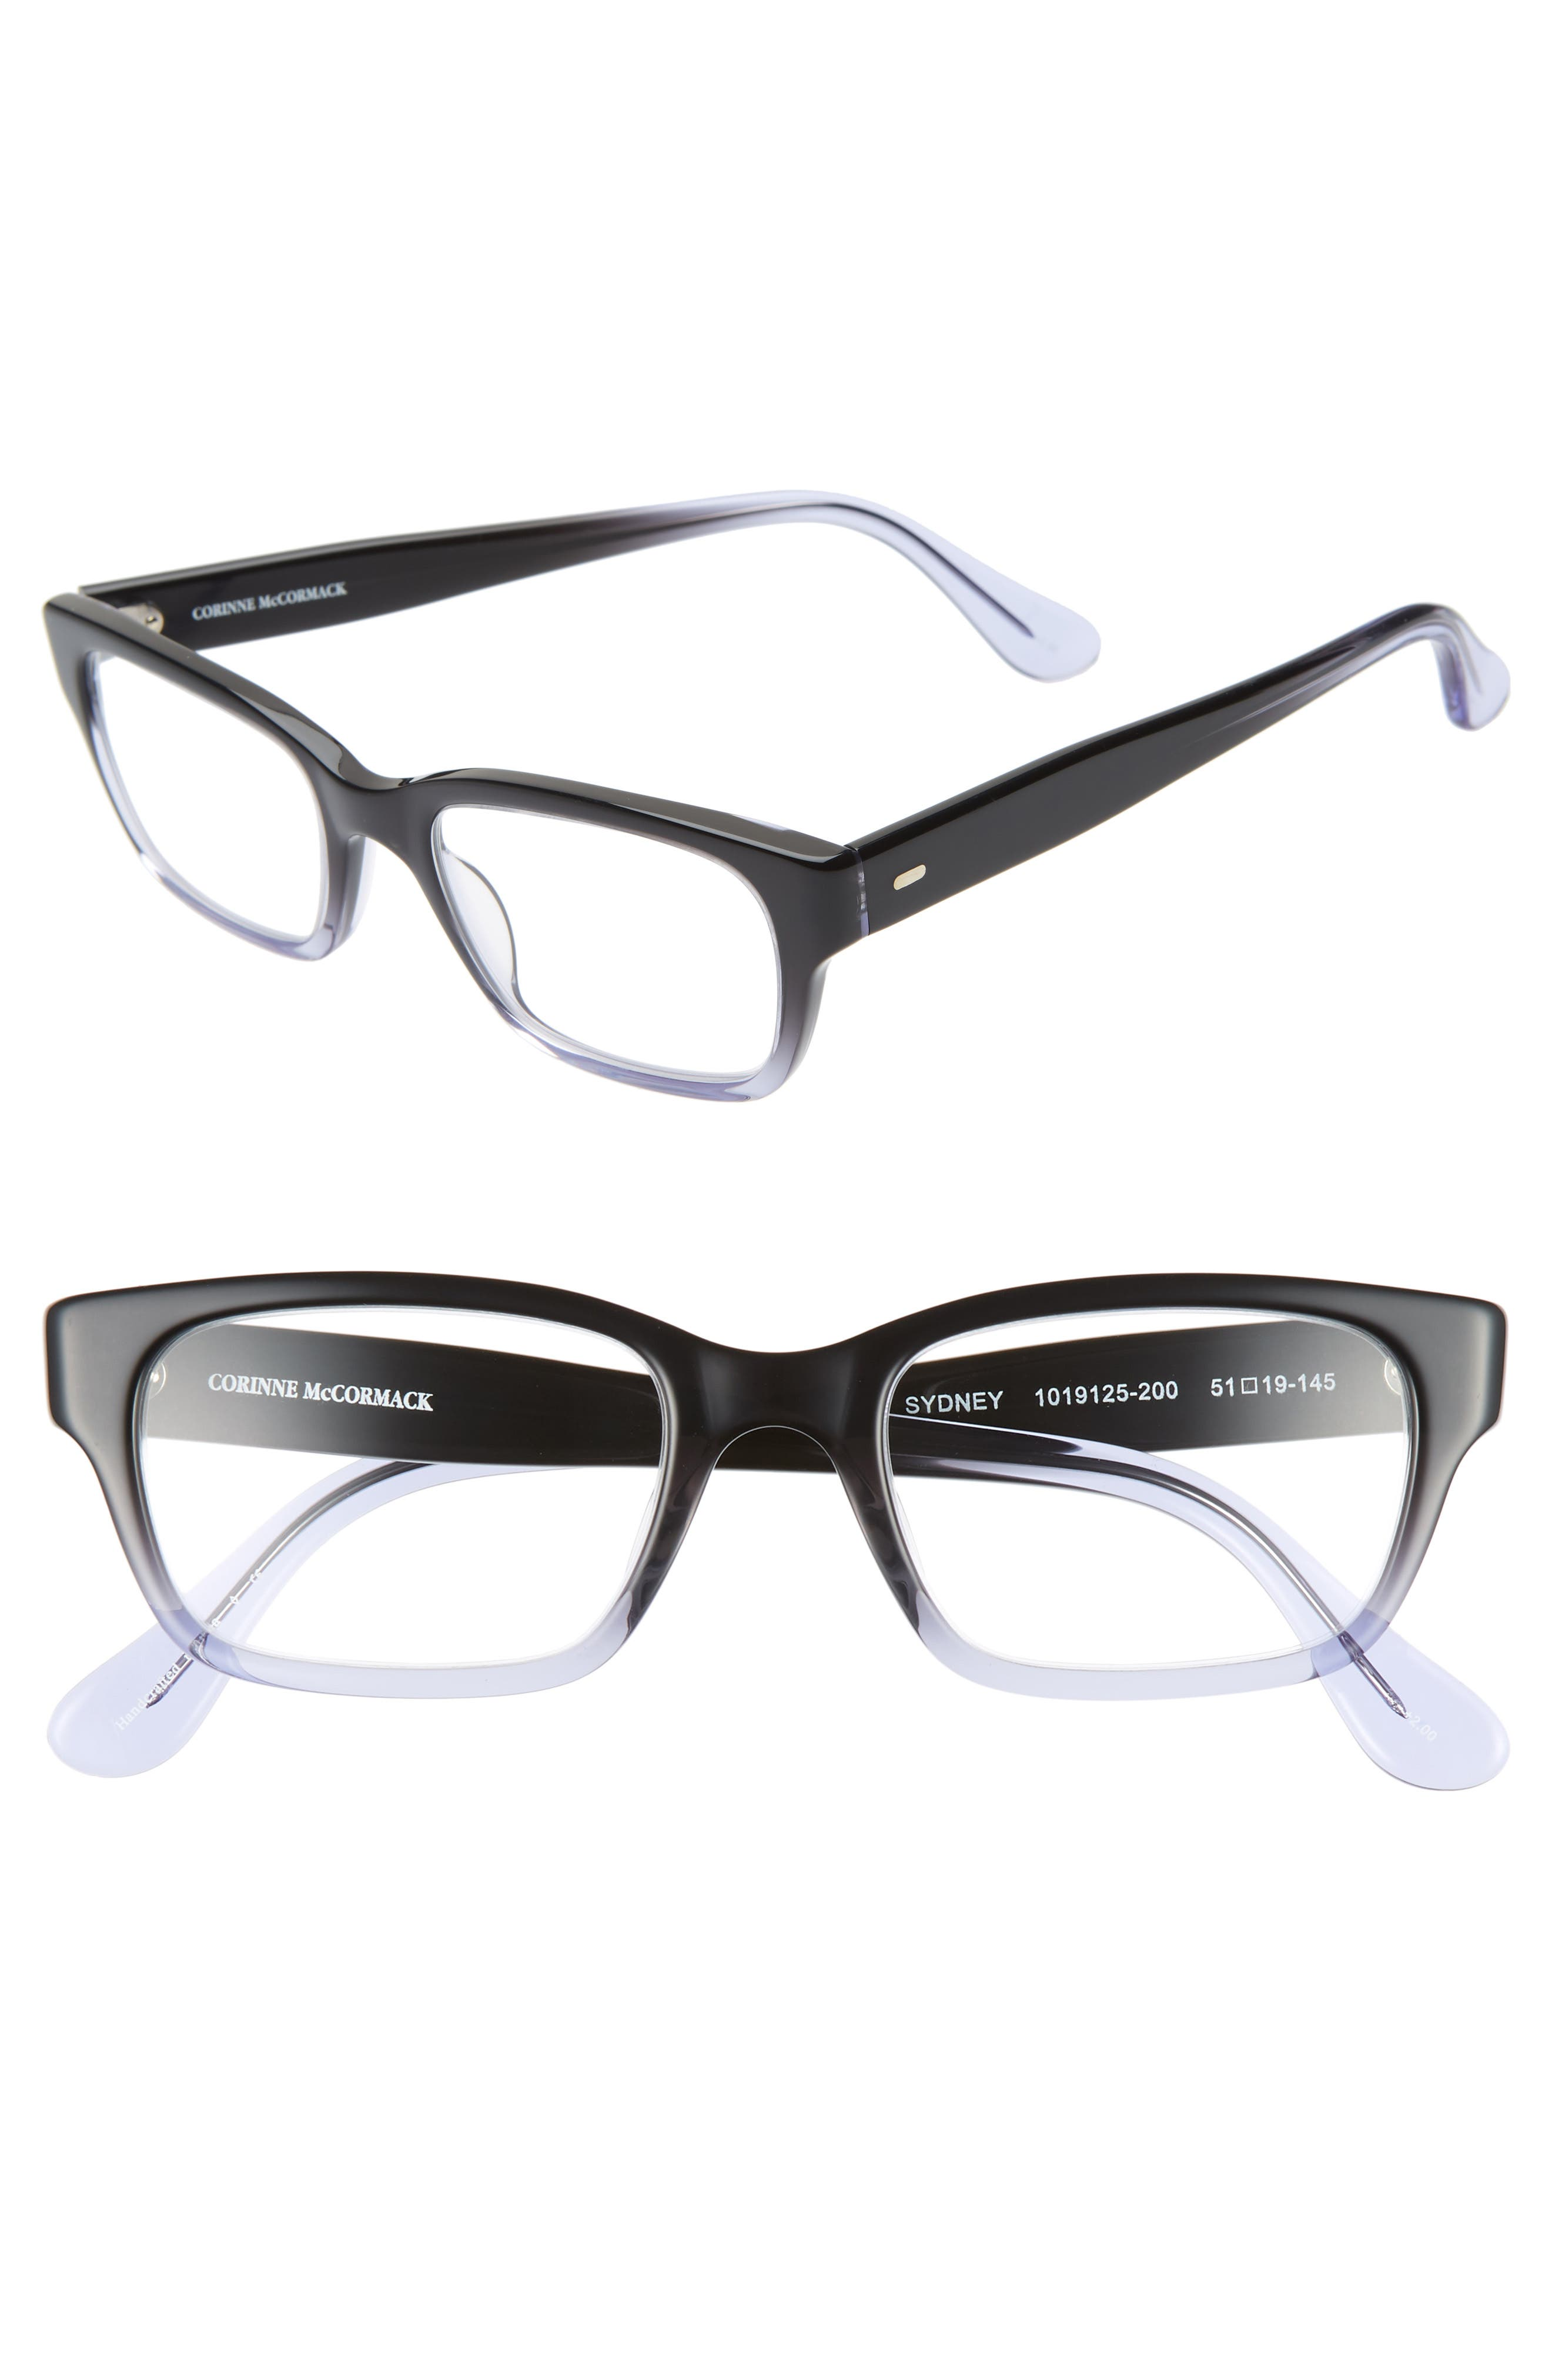 CORINNE MCCORMACK 'Sydney' 51mm Reading Glasses, Main, color, 006